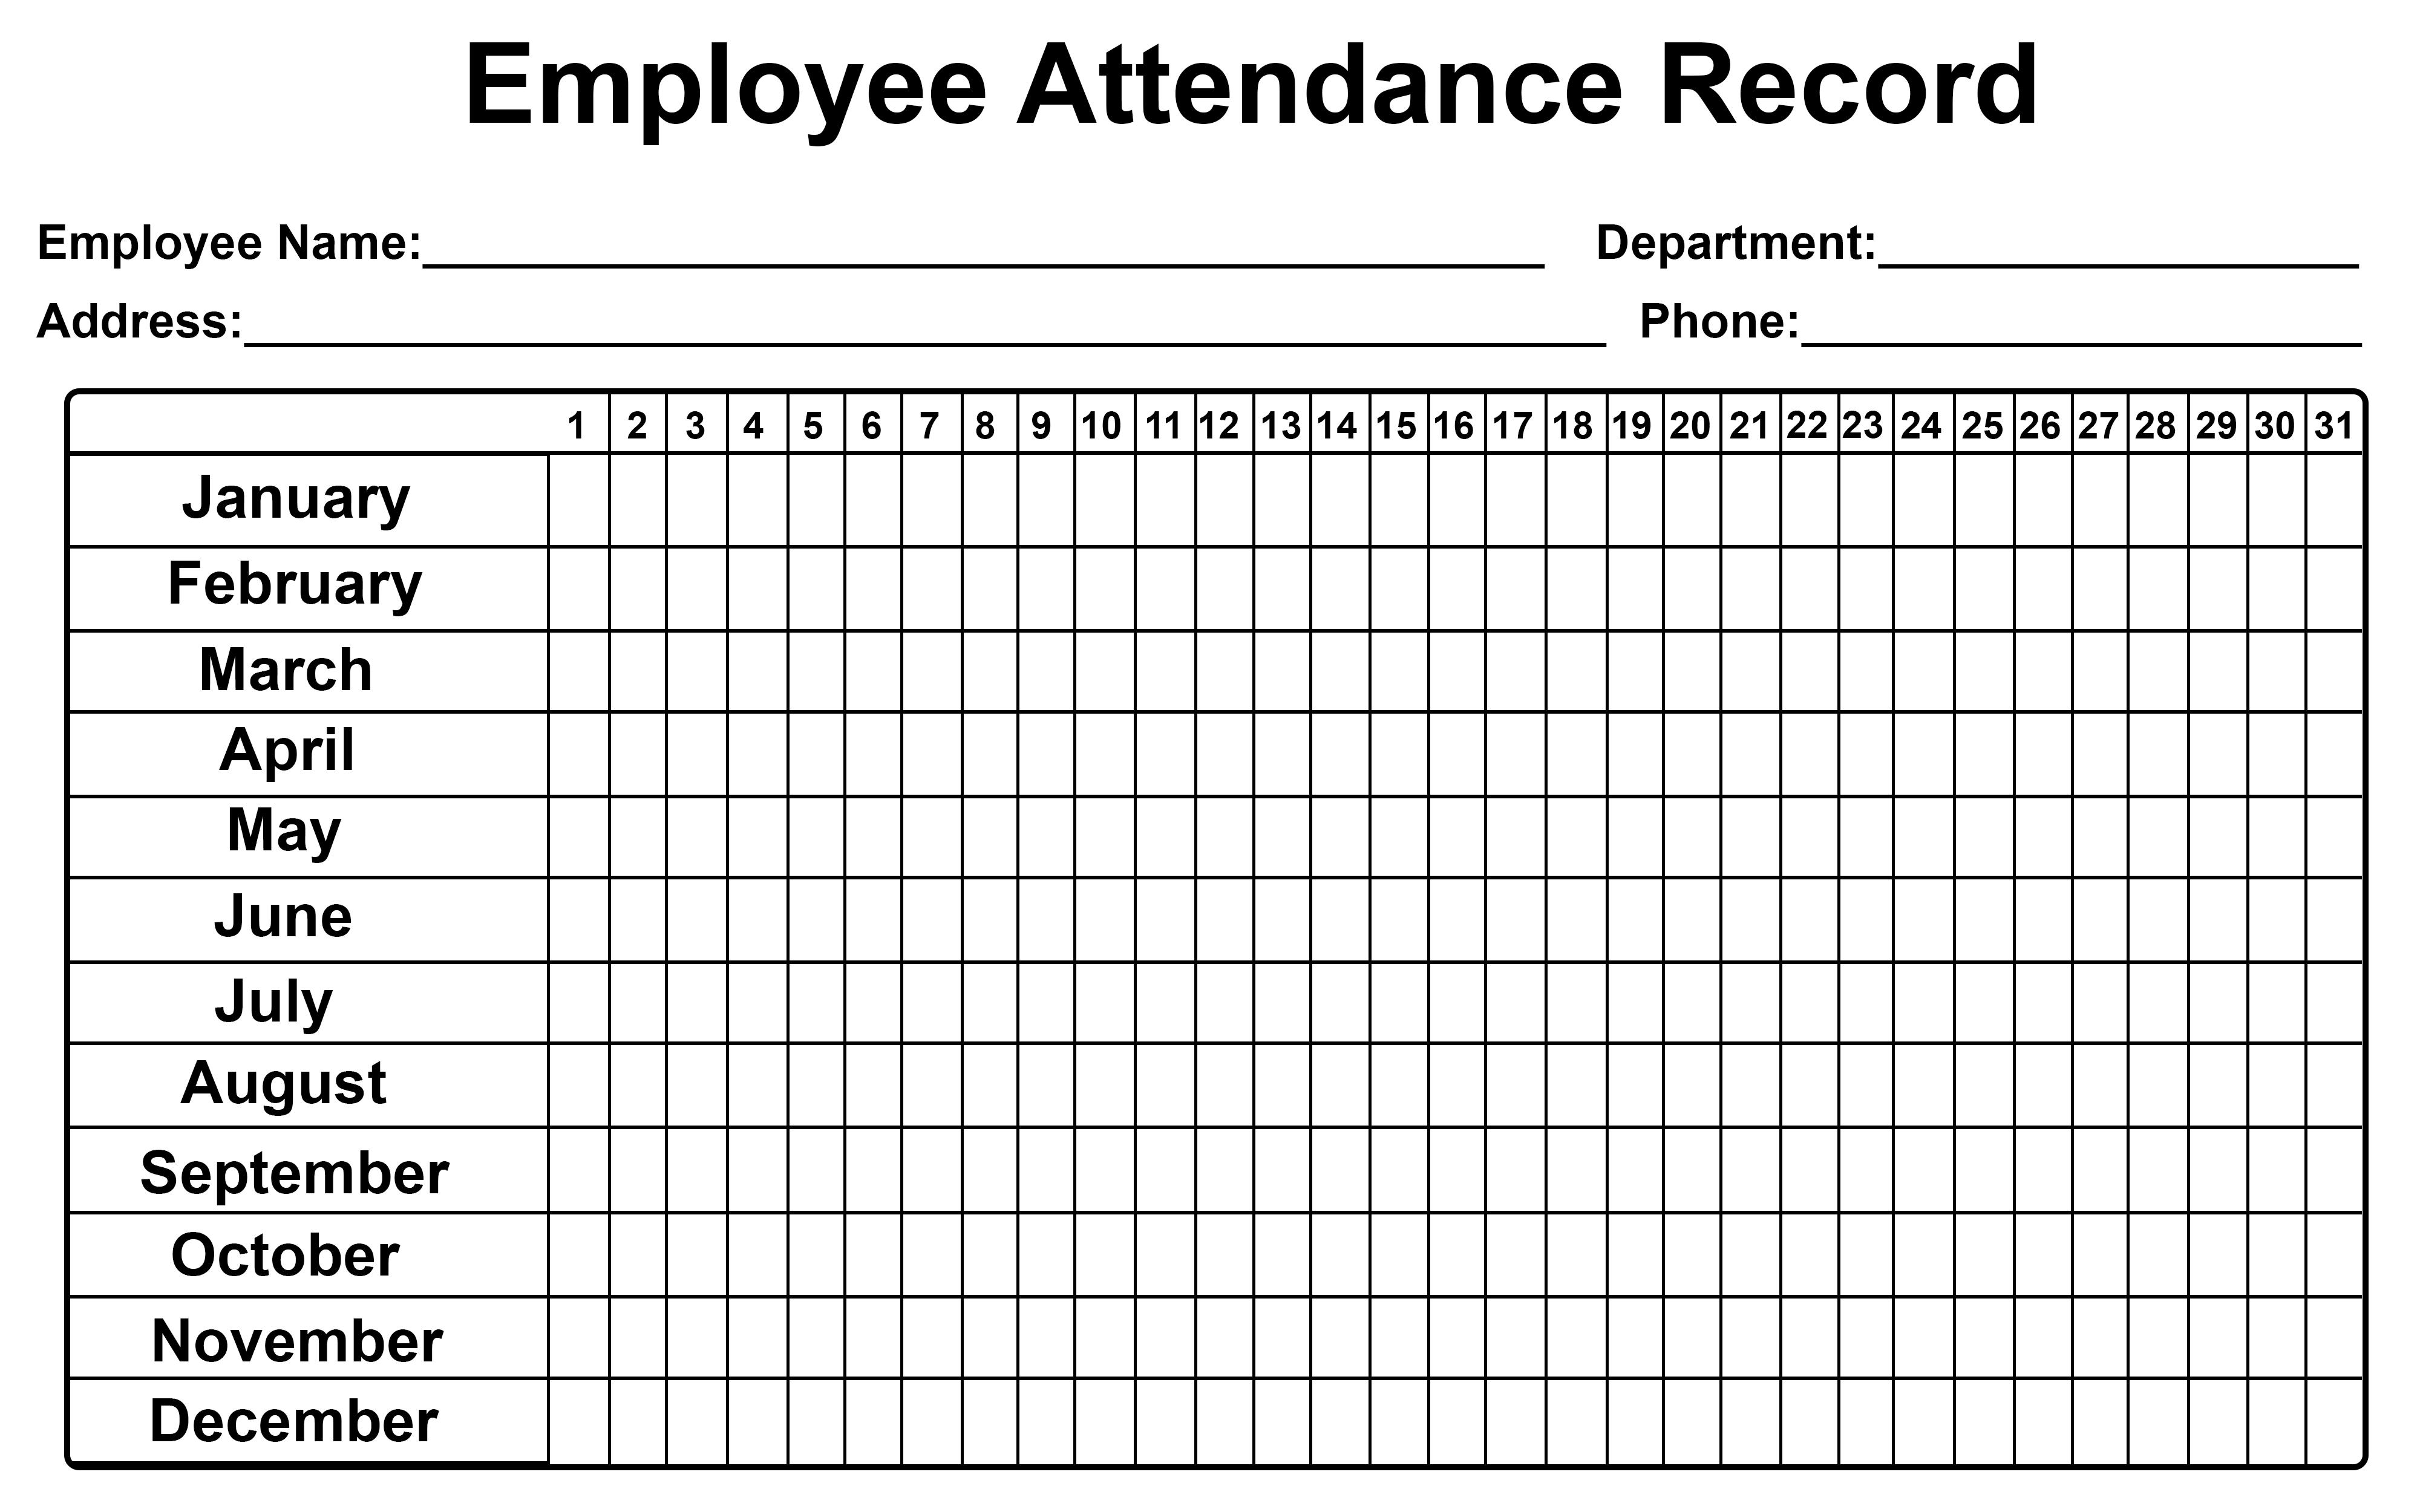 Employee Attendance Tracker Sheet 2019 | Printable Calendar Diy-2020 Employee Attendance Tracker Template Free